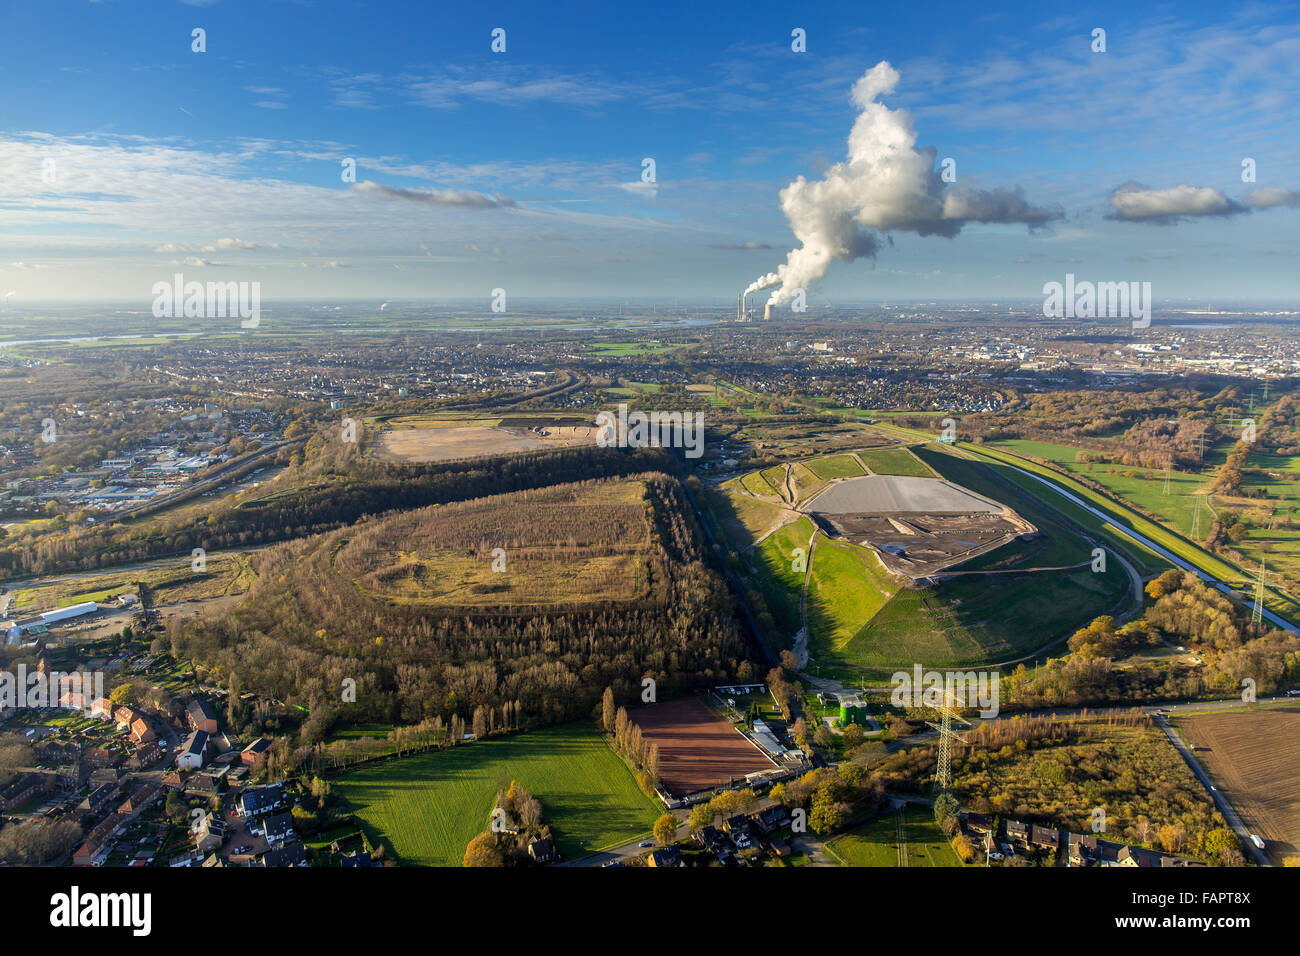 Slag heaps and Wehofen landfill, behind Dinslaken, Ruhr district, North Rhine-Westphalia, Germany - Stock Image